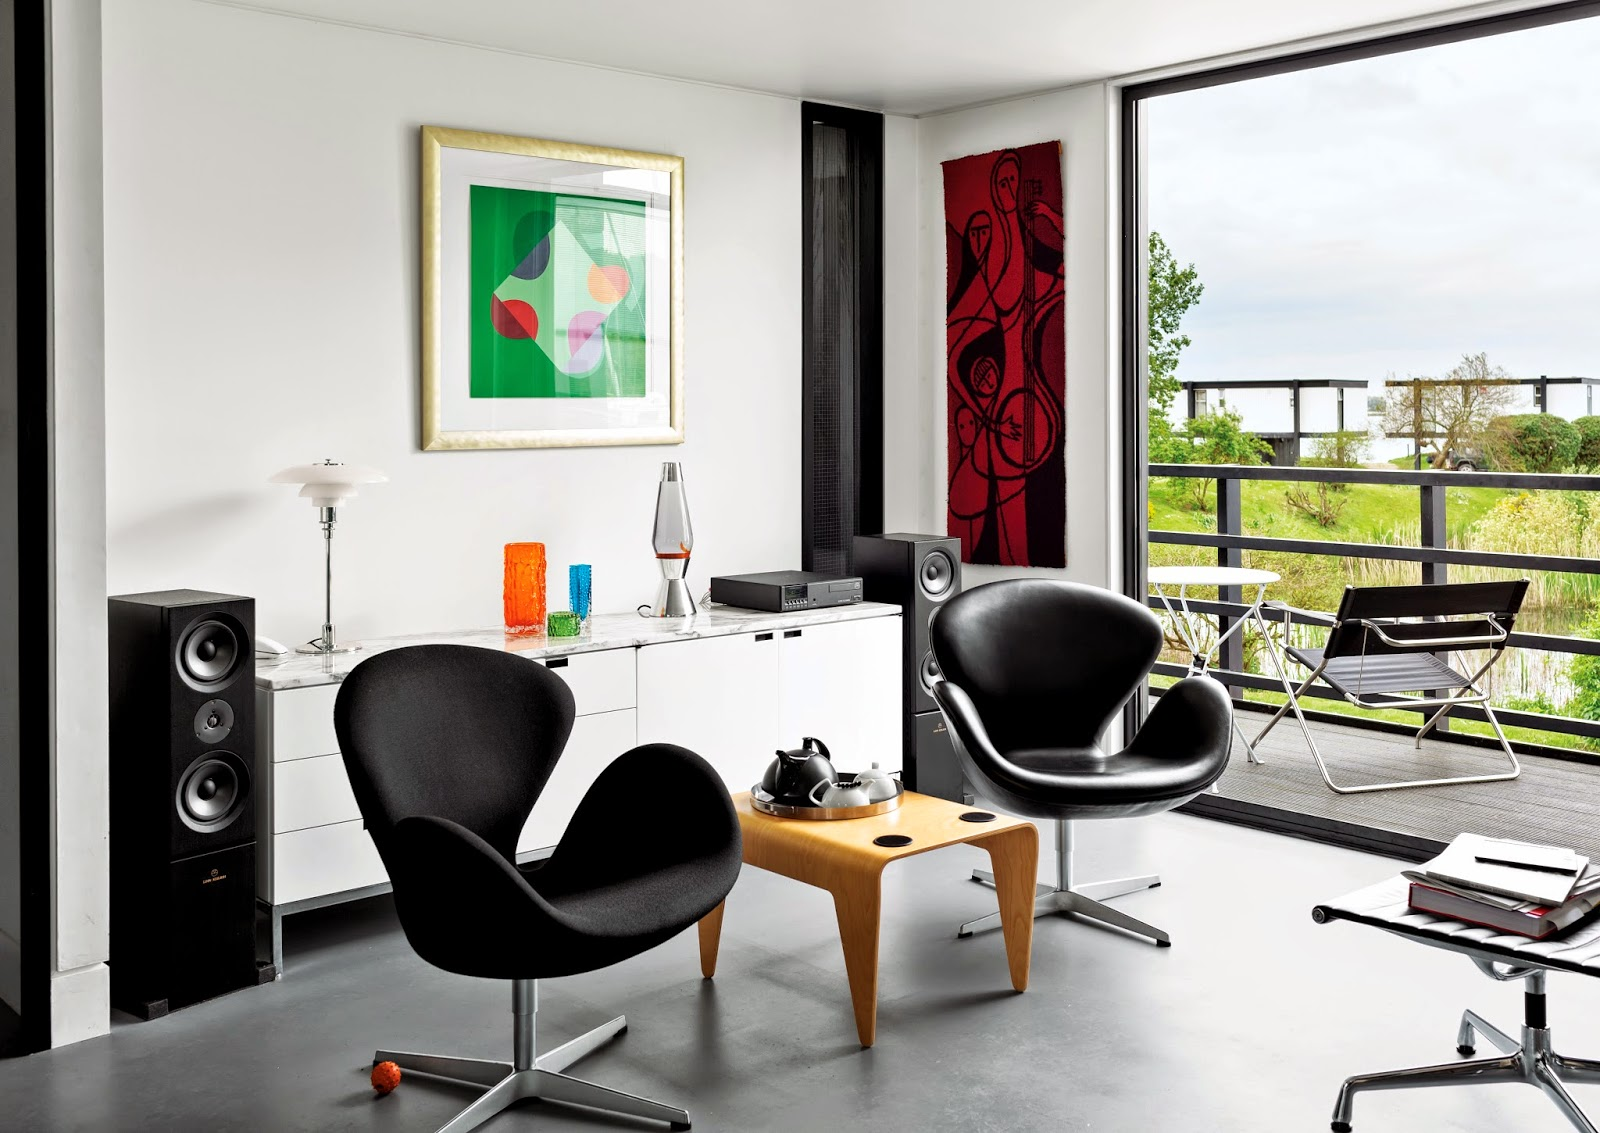 Swan Chair Sessel trifft auf Florence Knoll Sideboard – erlesene Designklassiker